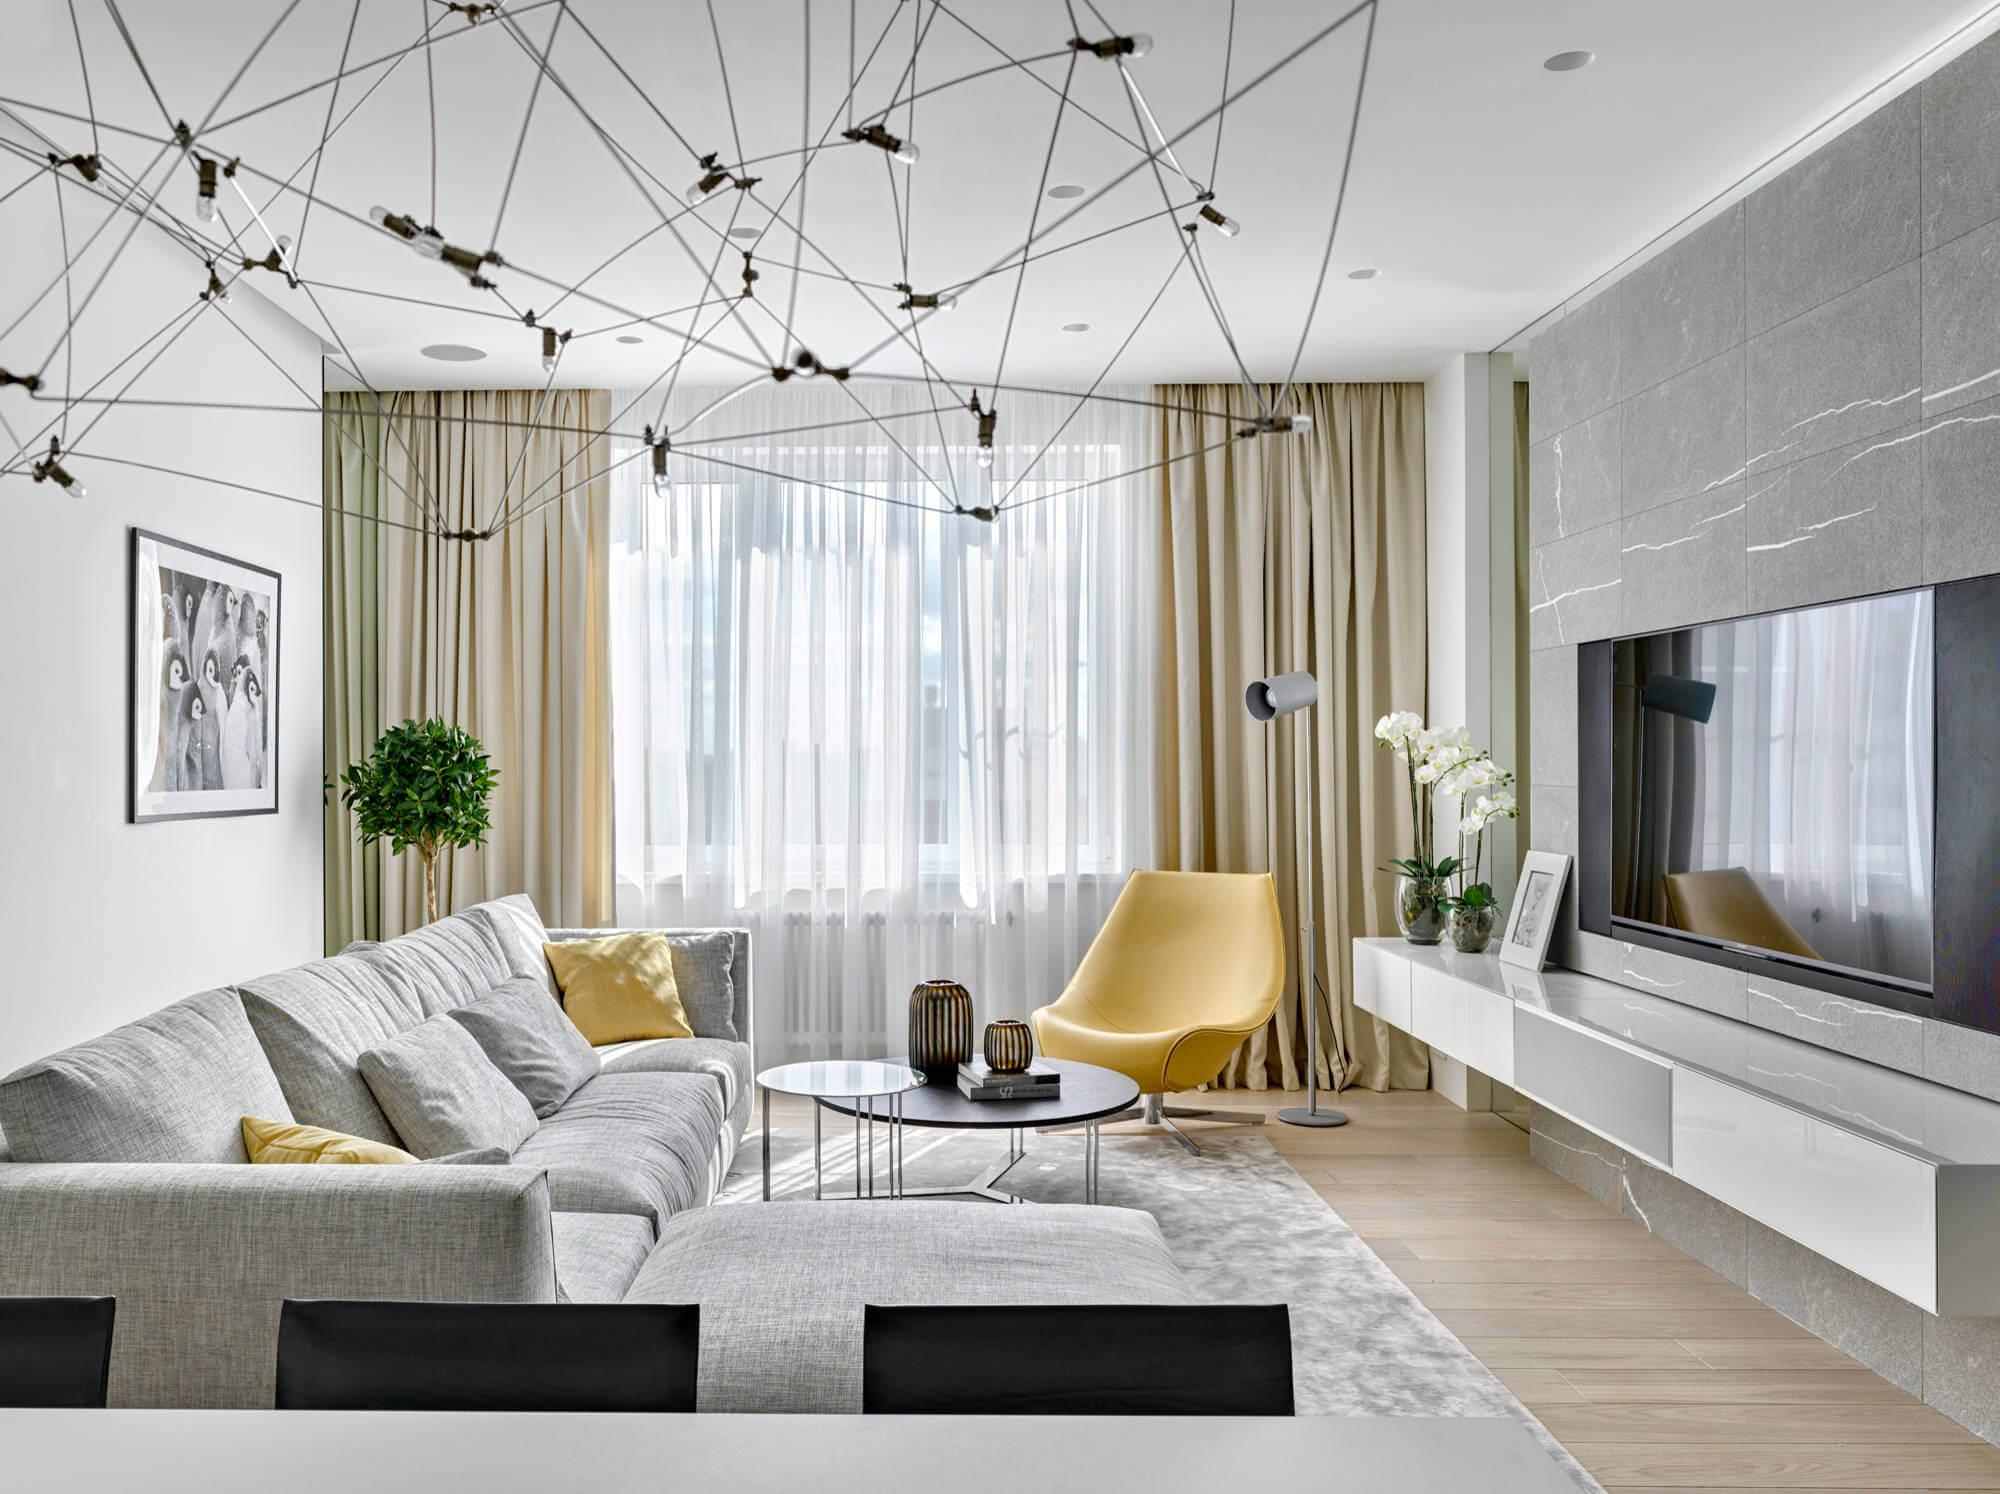 stoletova-street-apartment-alexandra-fedorova-19